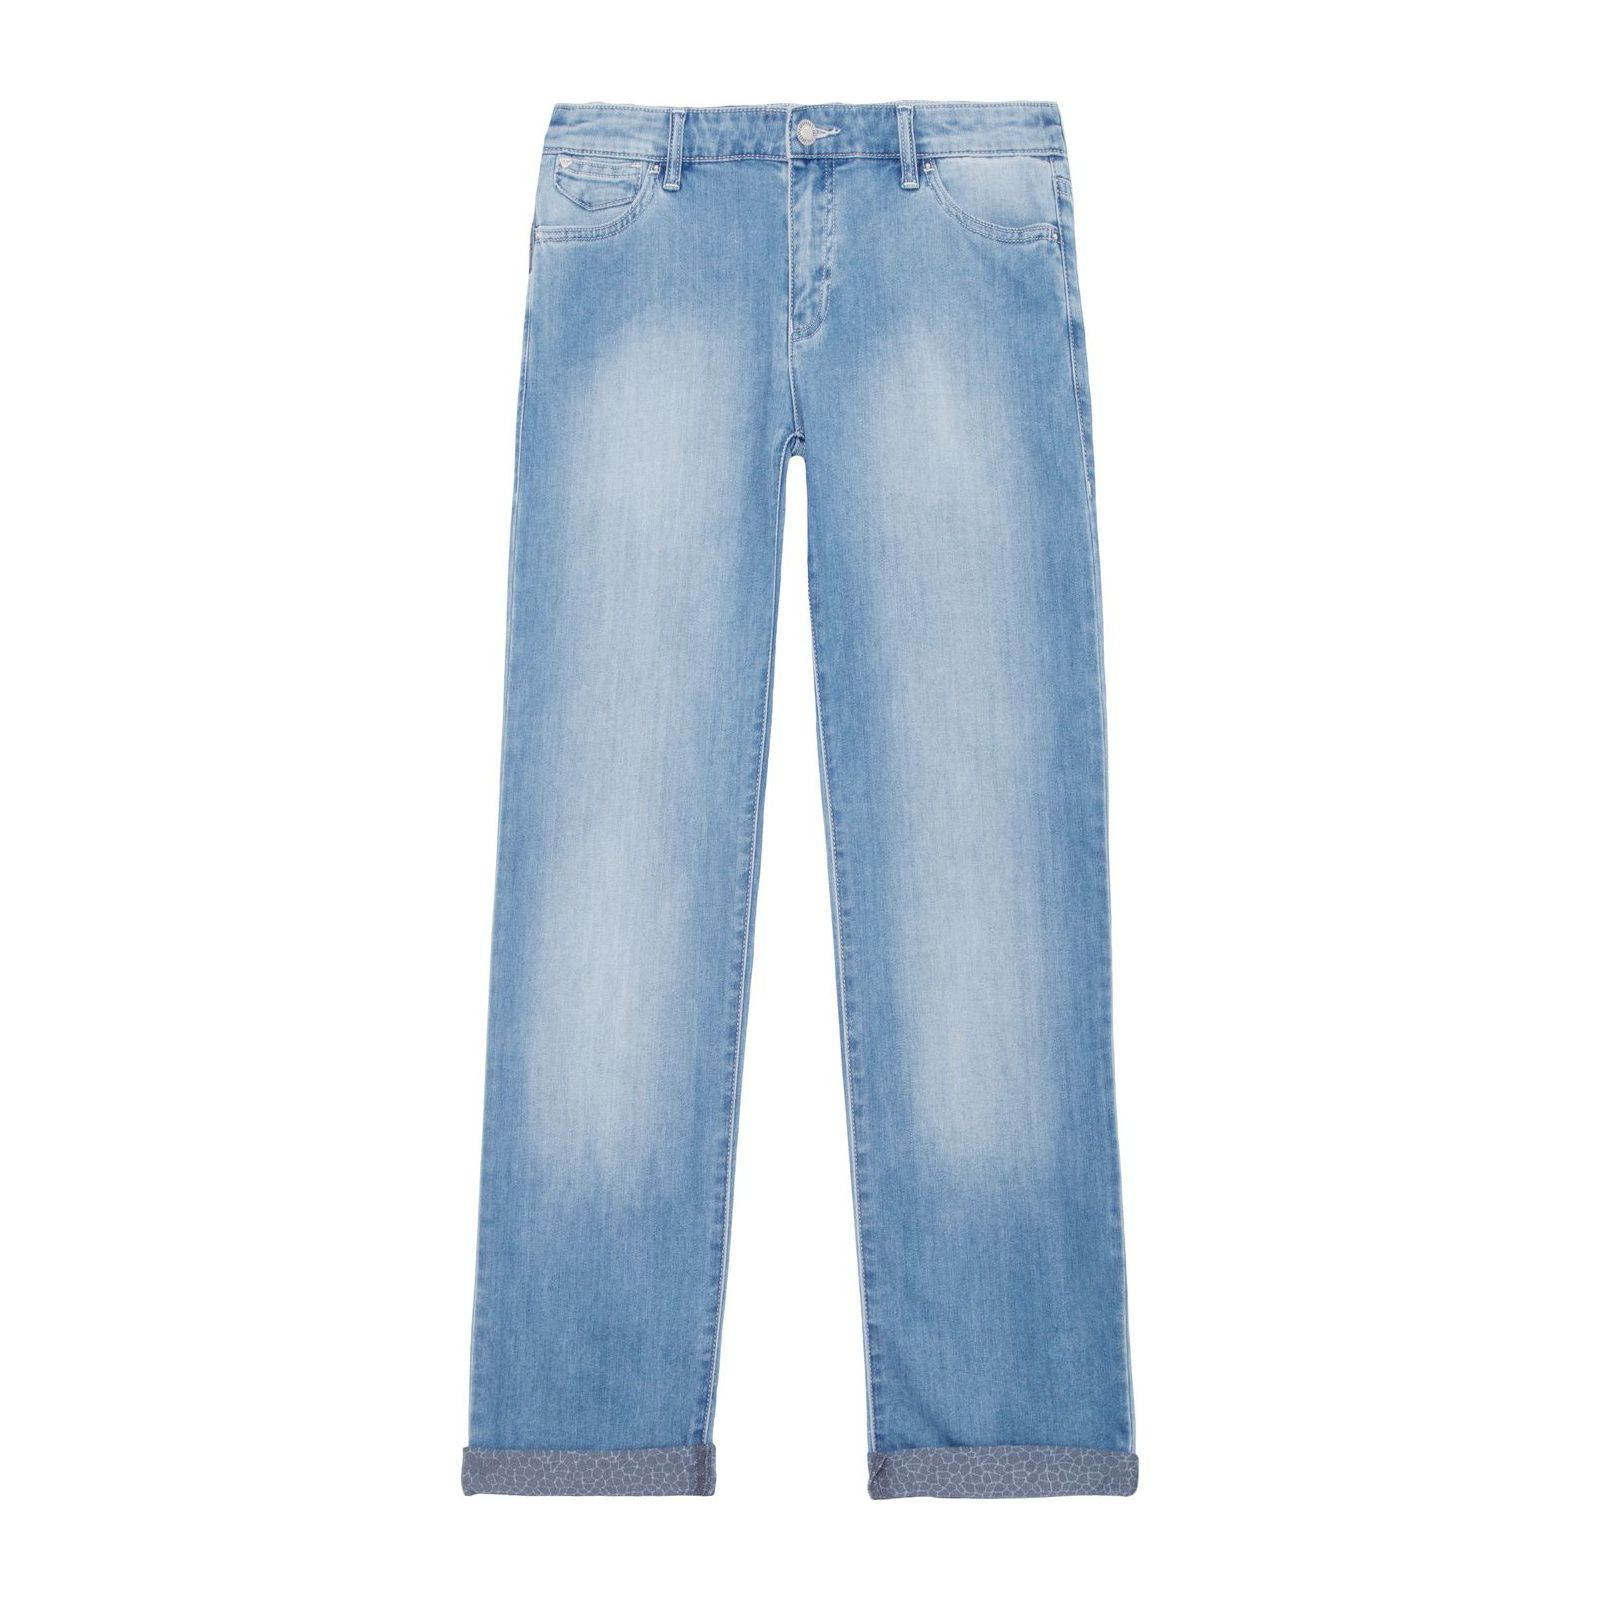 Calça Jeans J15 Slim Girl